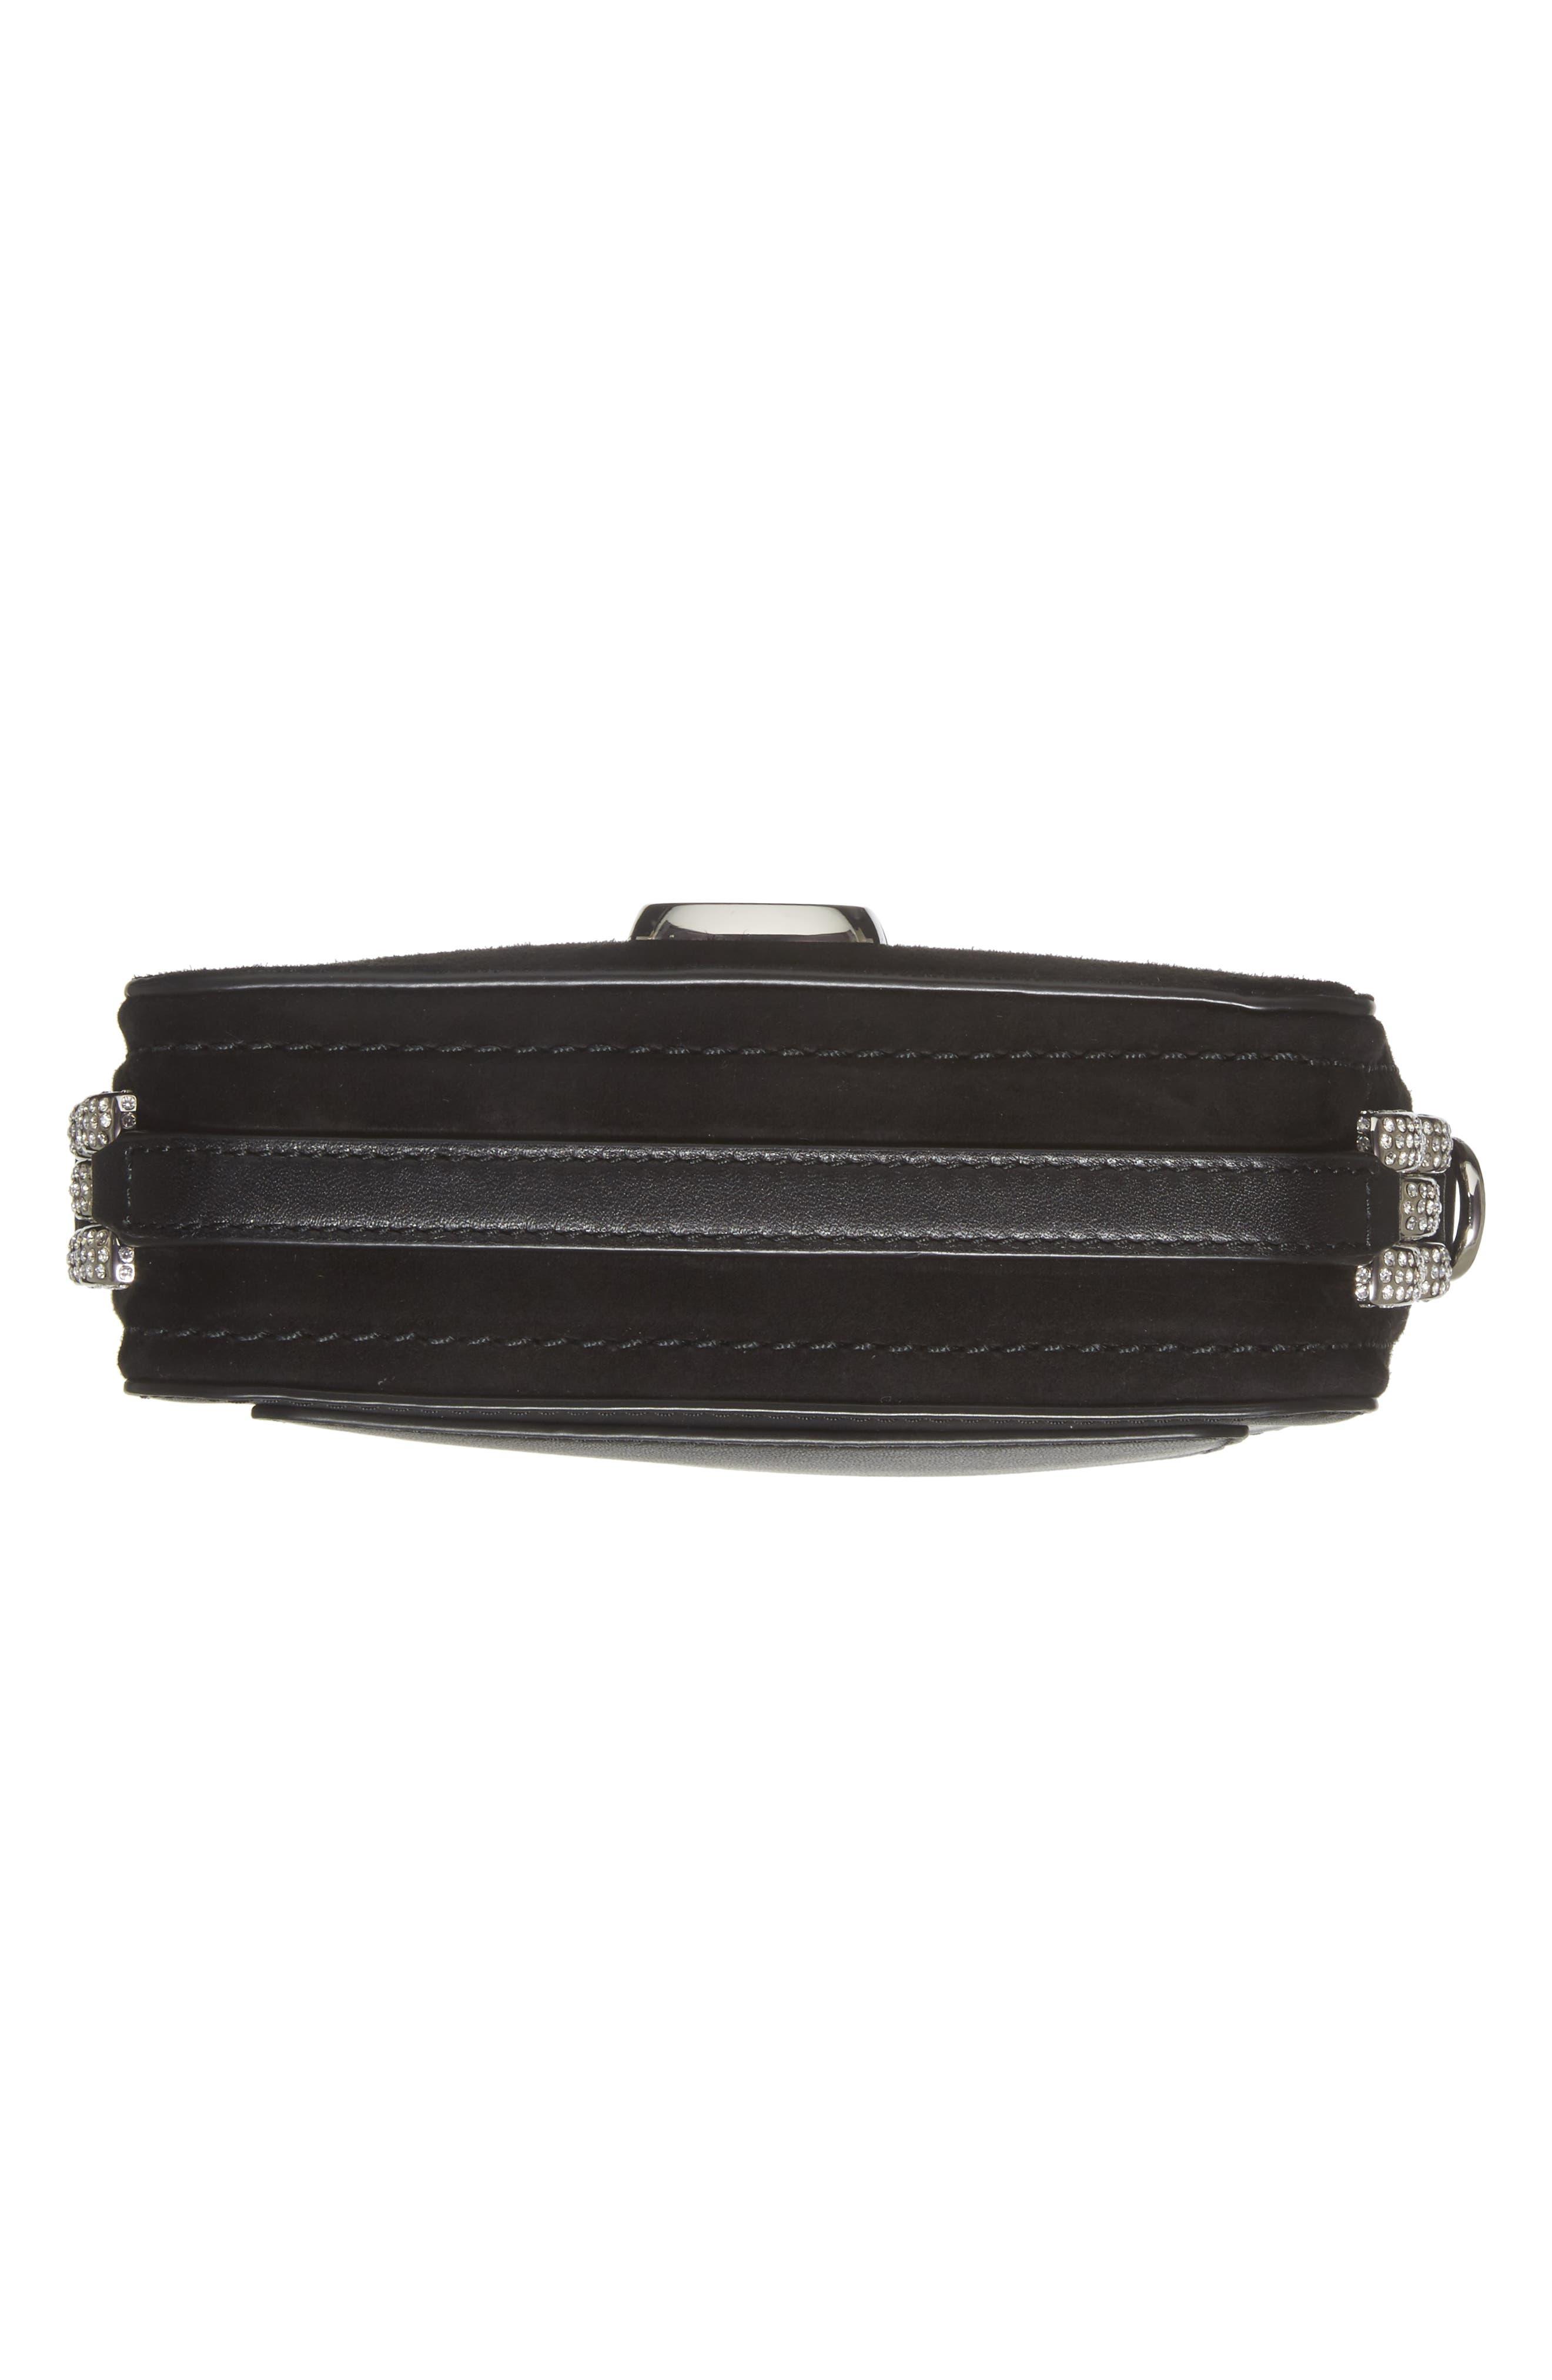 Snapshot Leather Pavé Chain Trim Crossbody Bag,                             Alternate thumbnail 6, color,                             001